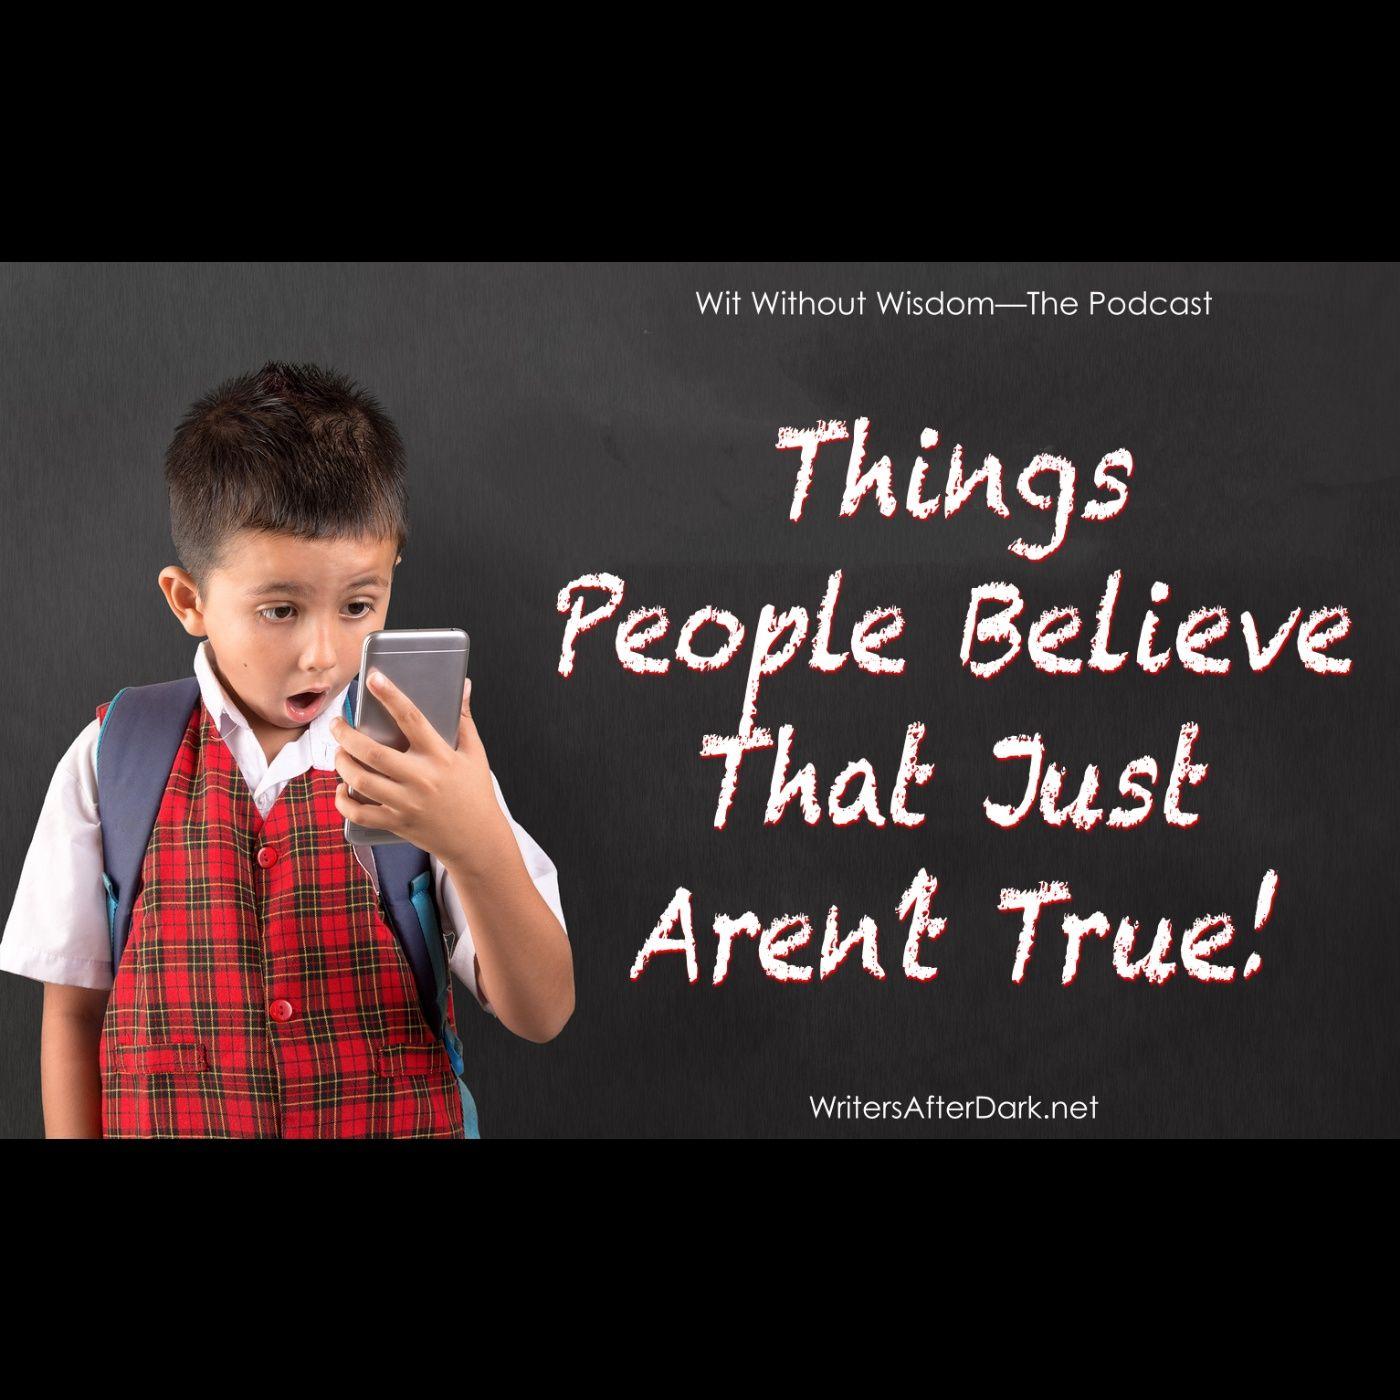 Things People Believe That Just Aren't True